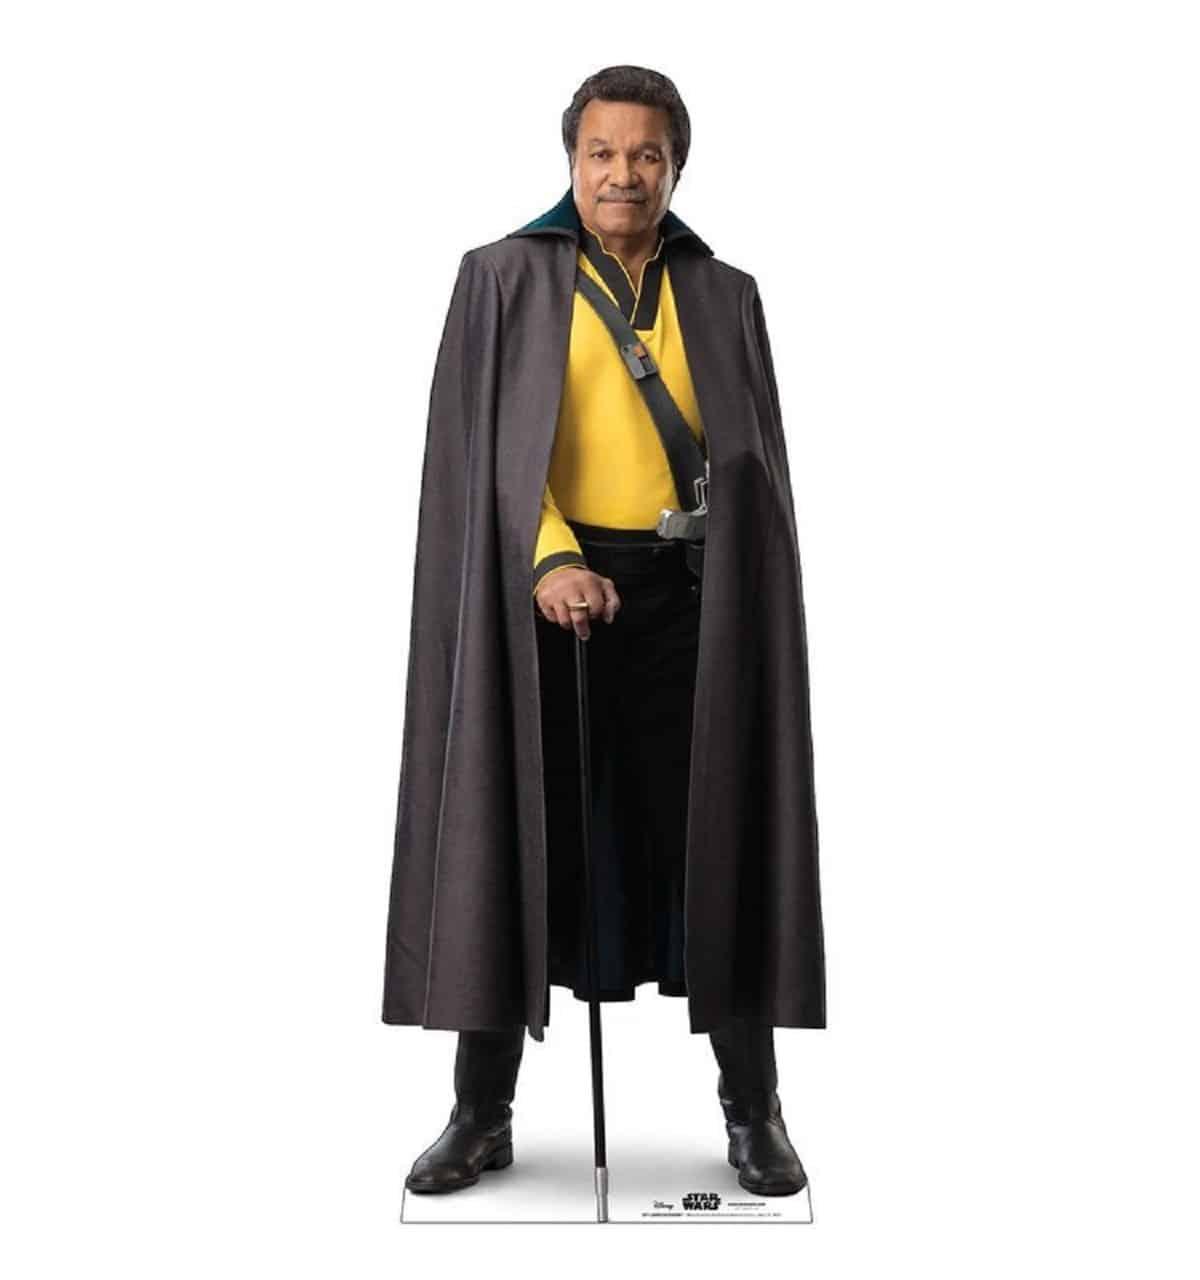 Lando Calrissian returns in Star Wars: The Rise of Skywalker